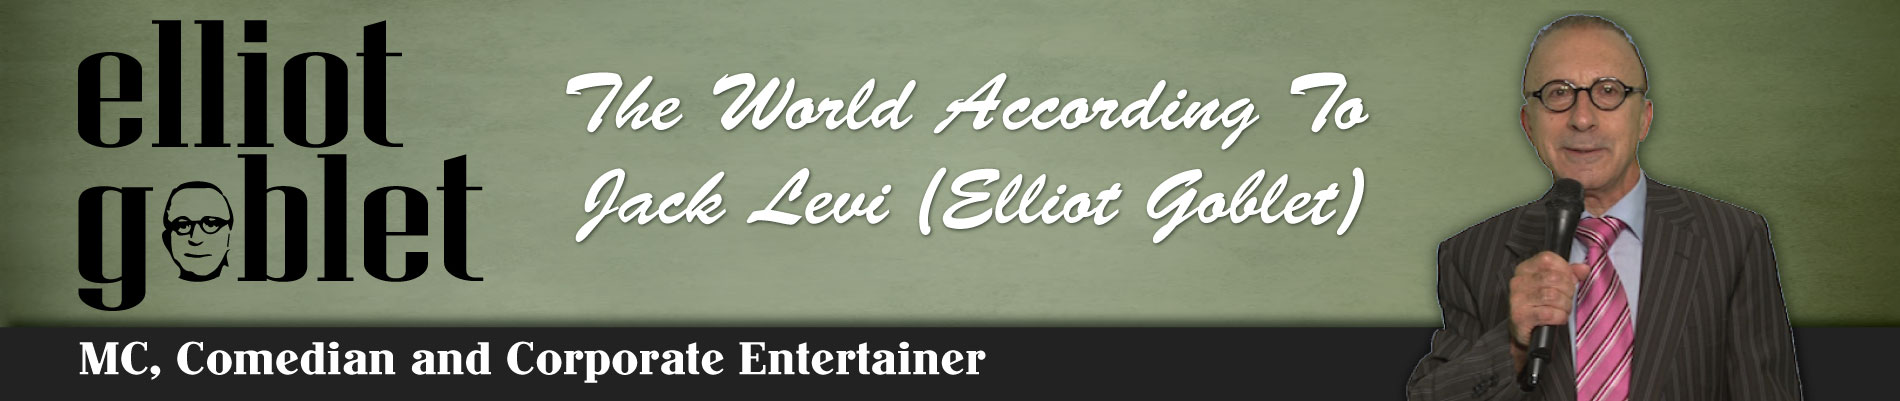 Blogs from Jack Levi (Elliot Goblet)